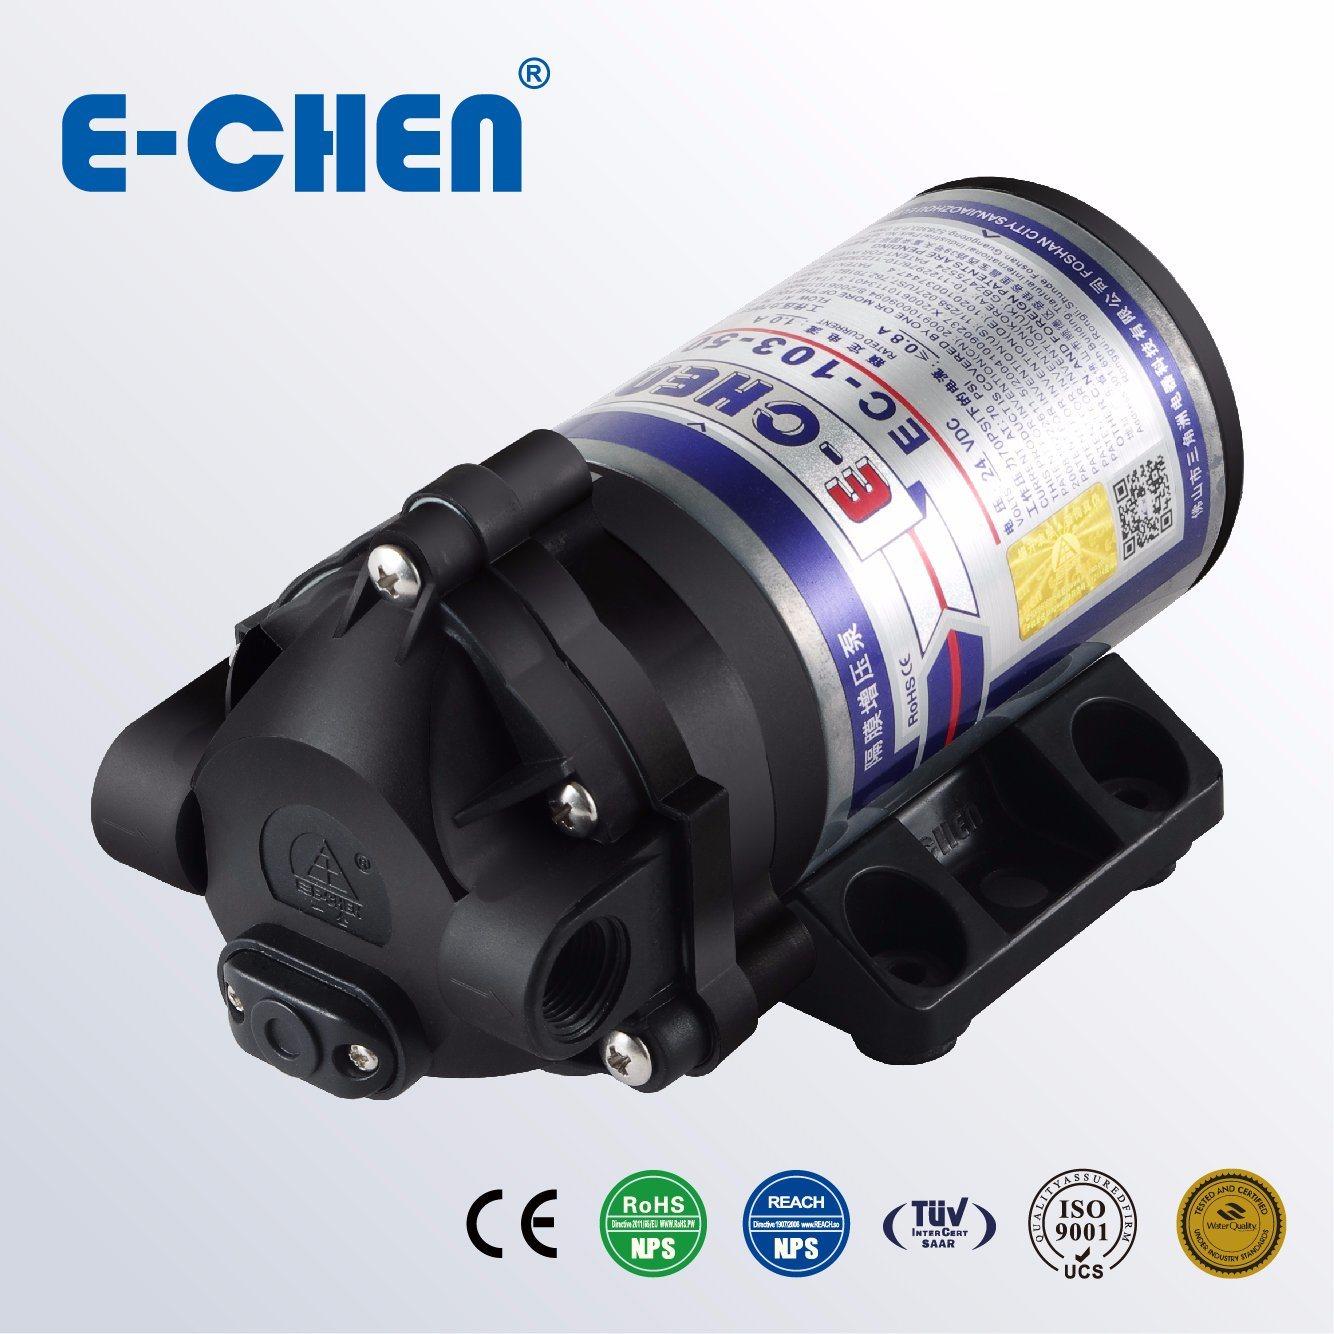 E-Chen 50gpd 103 Series Diaphragm RO Water Pump